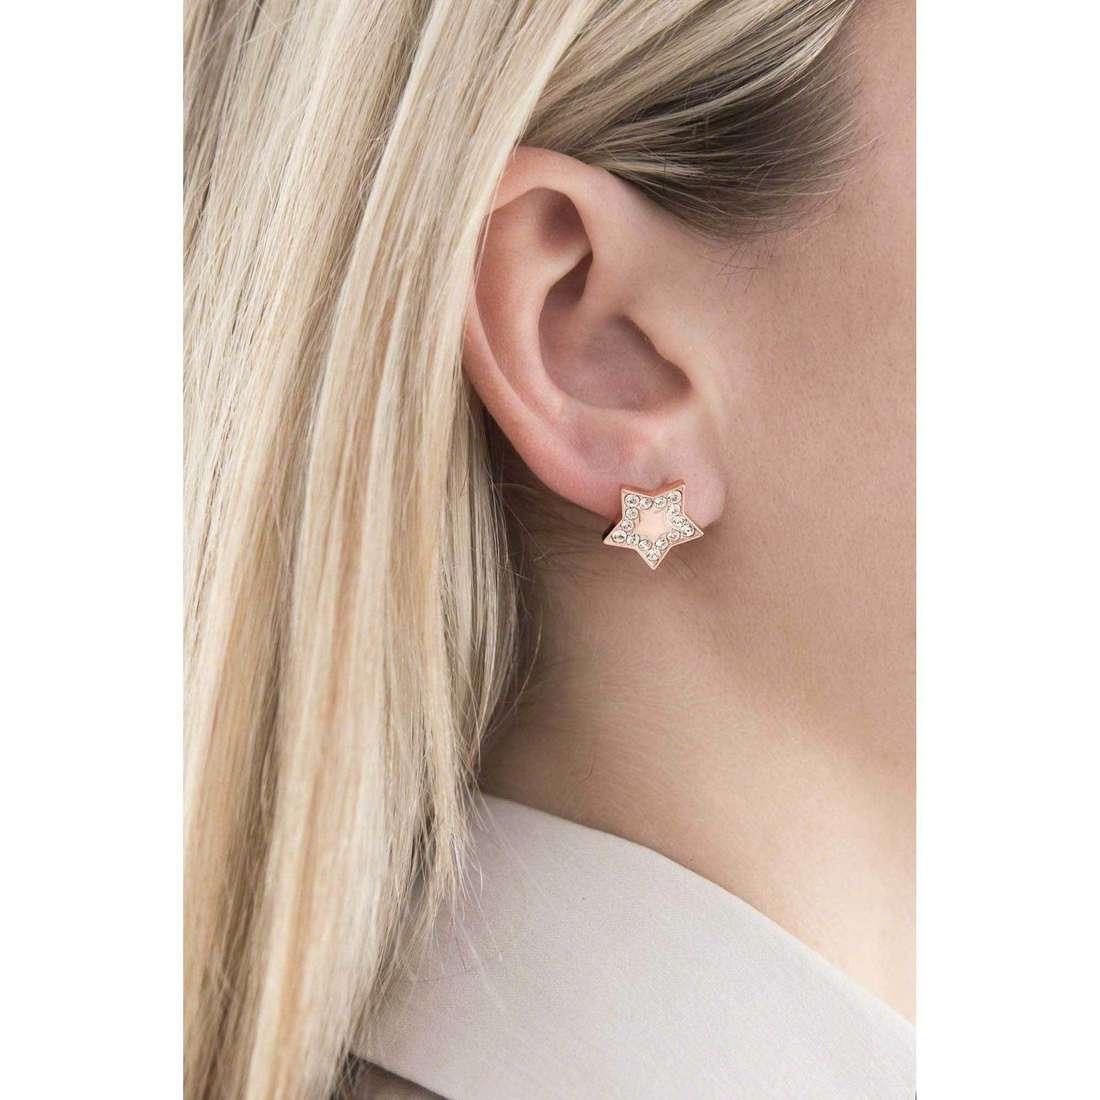 Morellato earrings Abbraccio woman SABG06 indosso